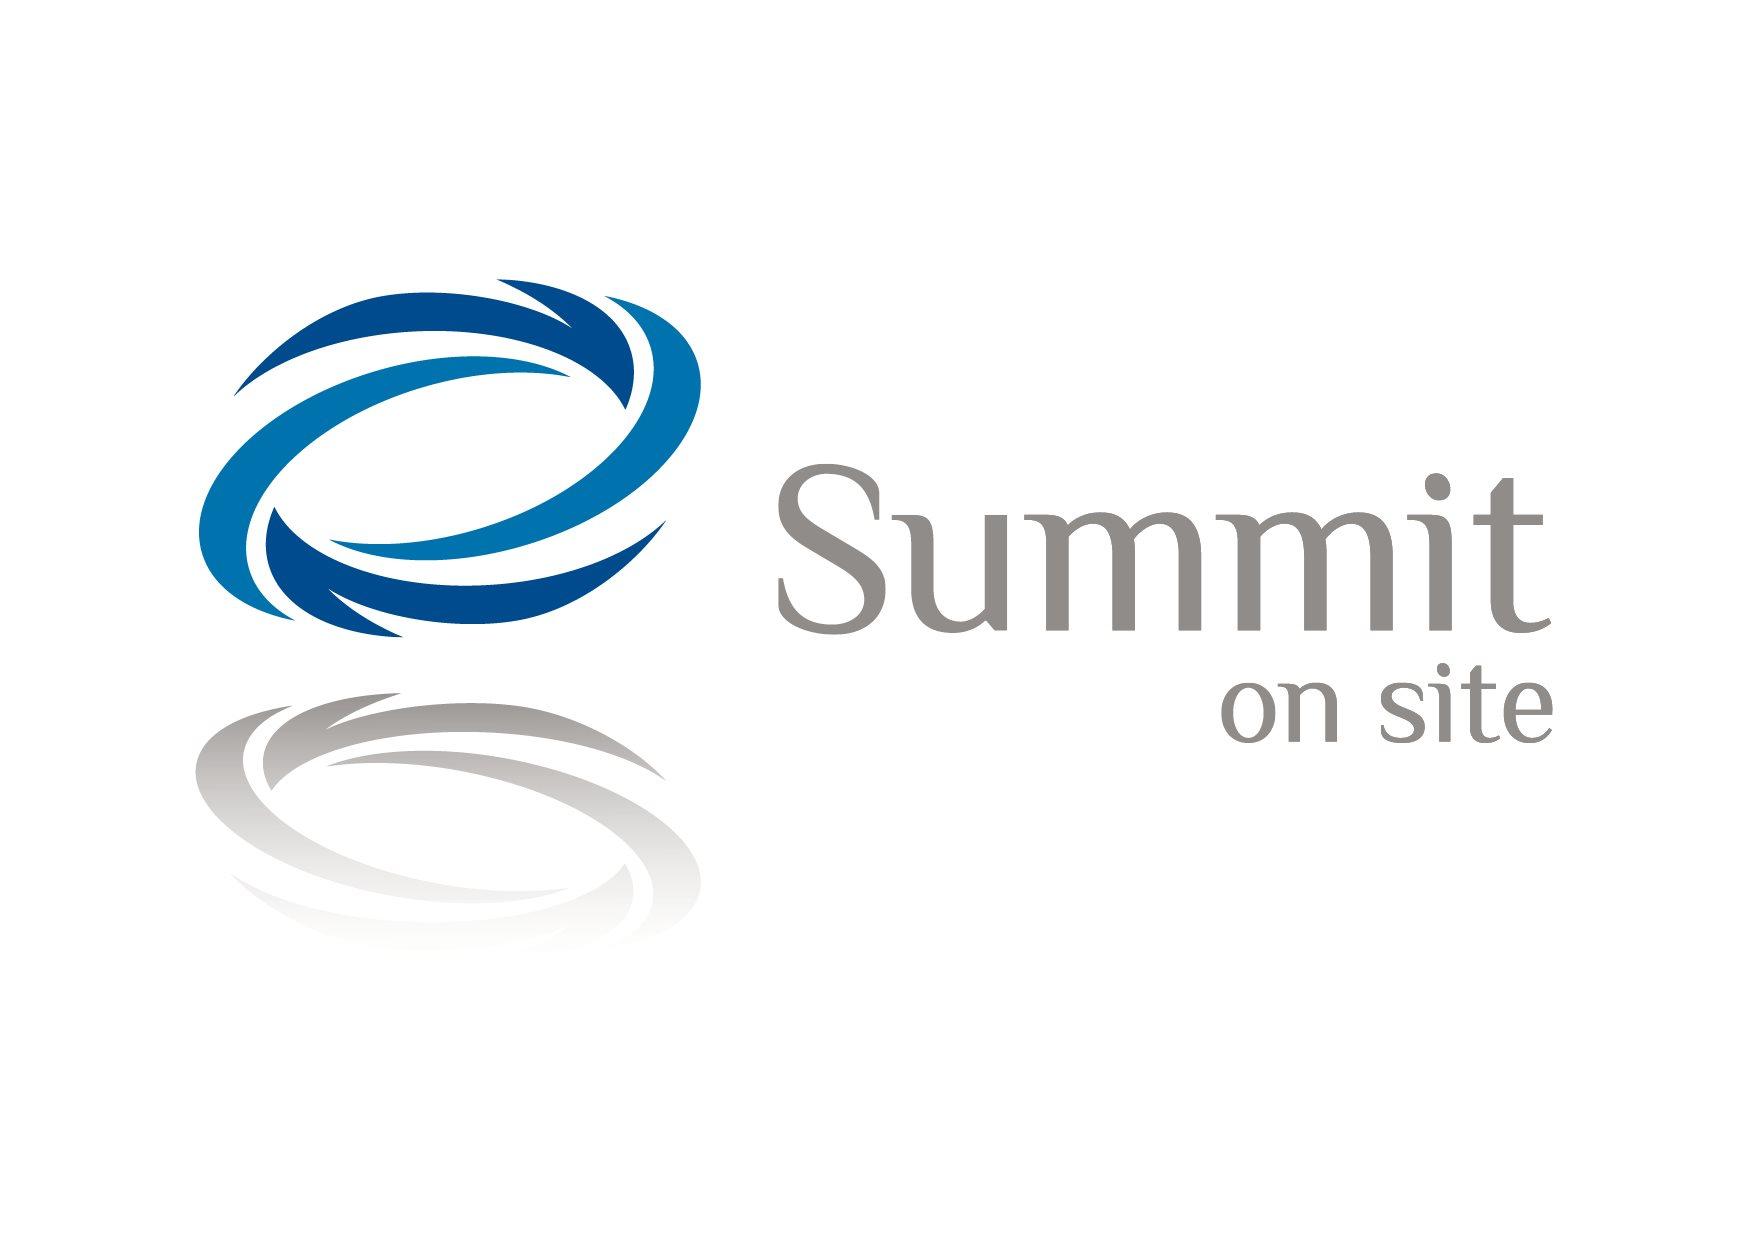 bestjobs jobs in summit on site summit on site